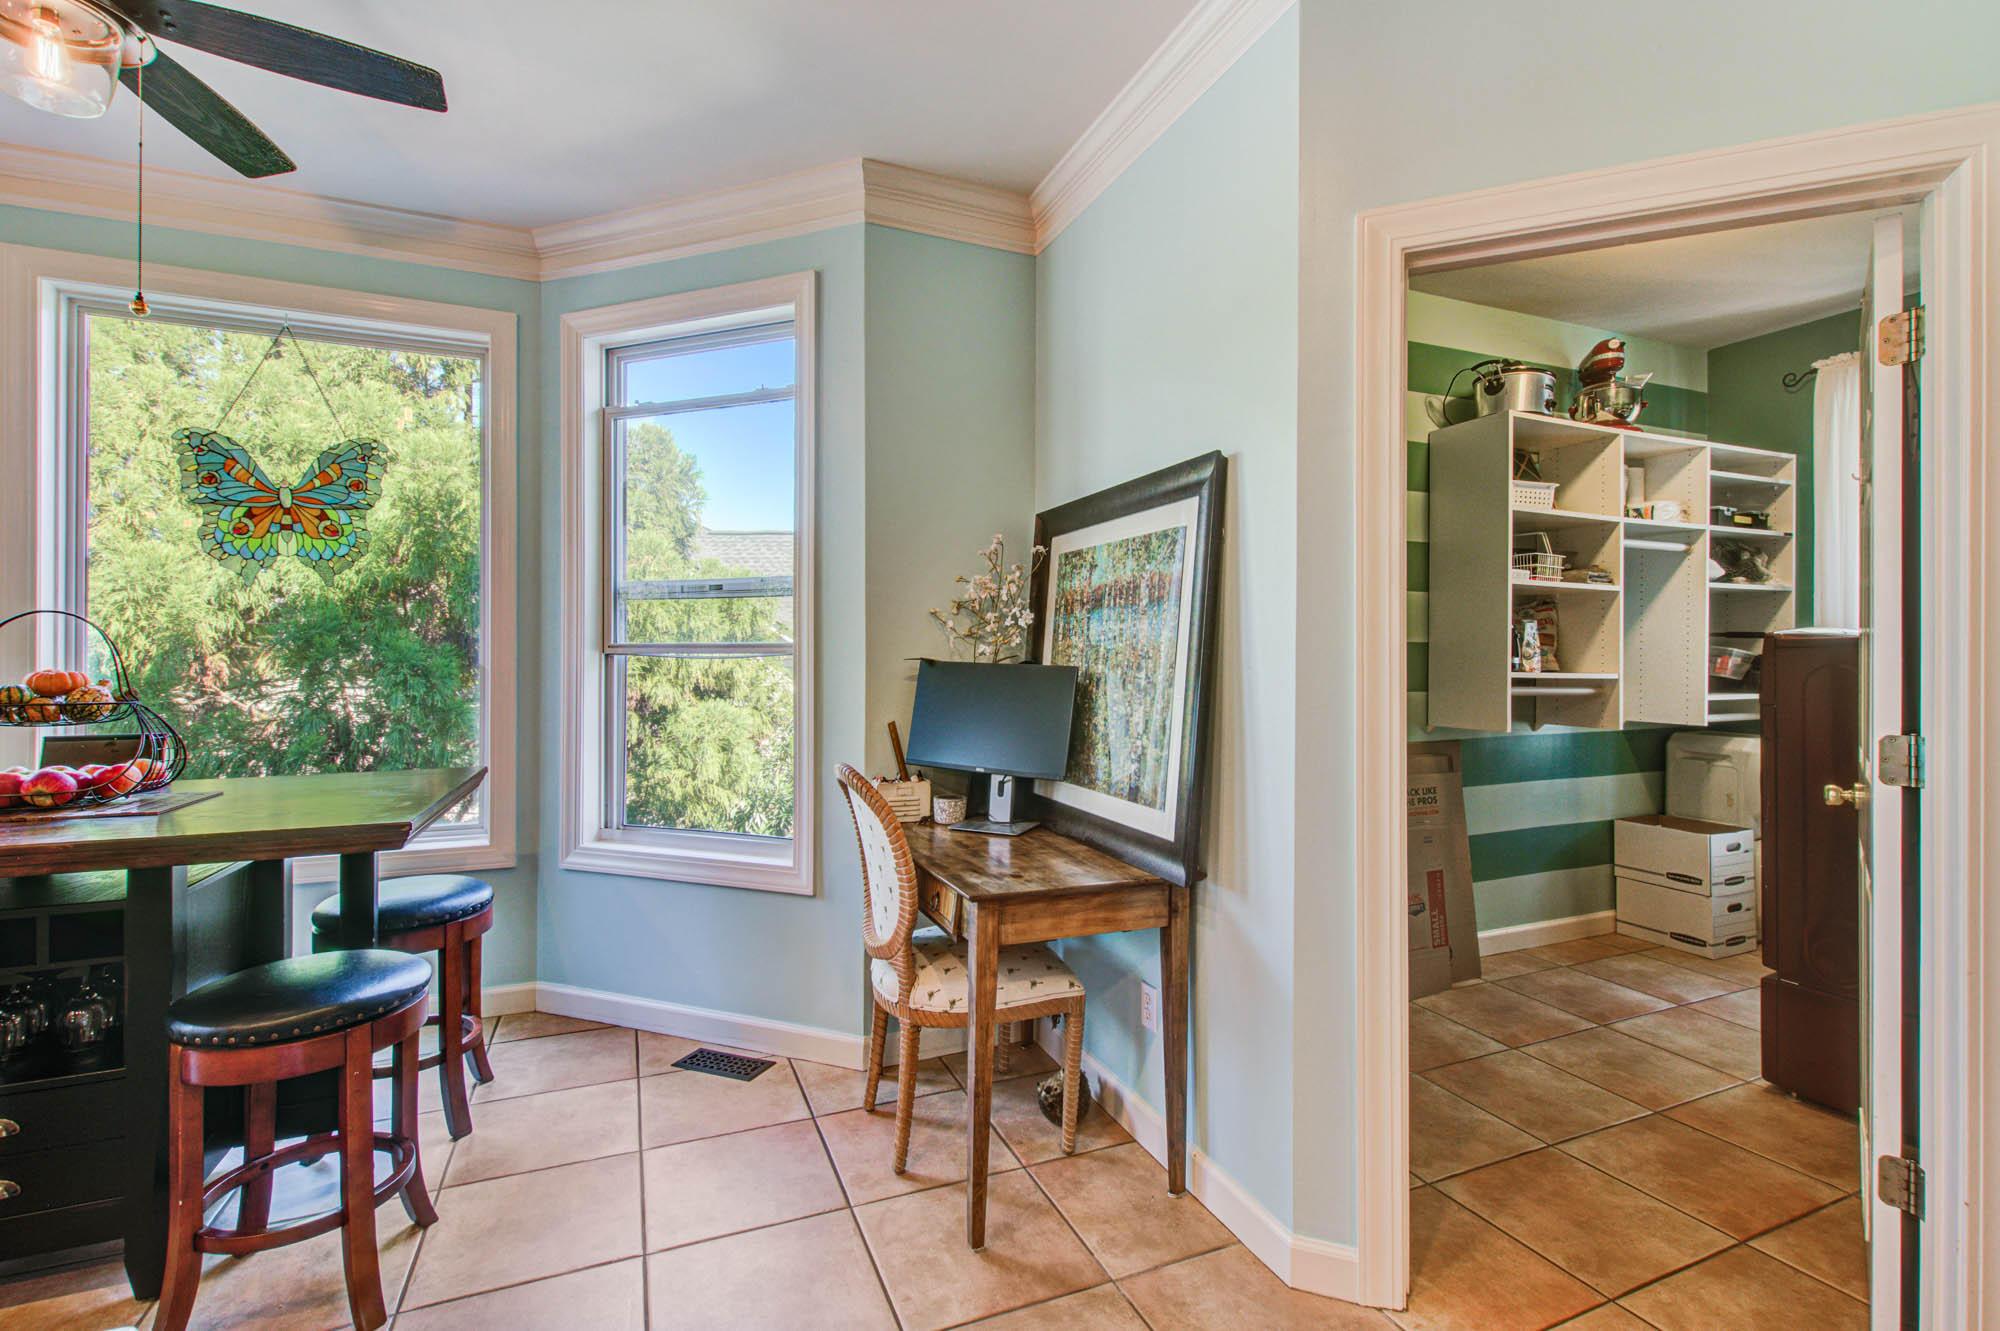 St Thomas Point Homes For Sale - 307 Jamesbury, Charleston, SC - 25